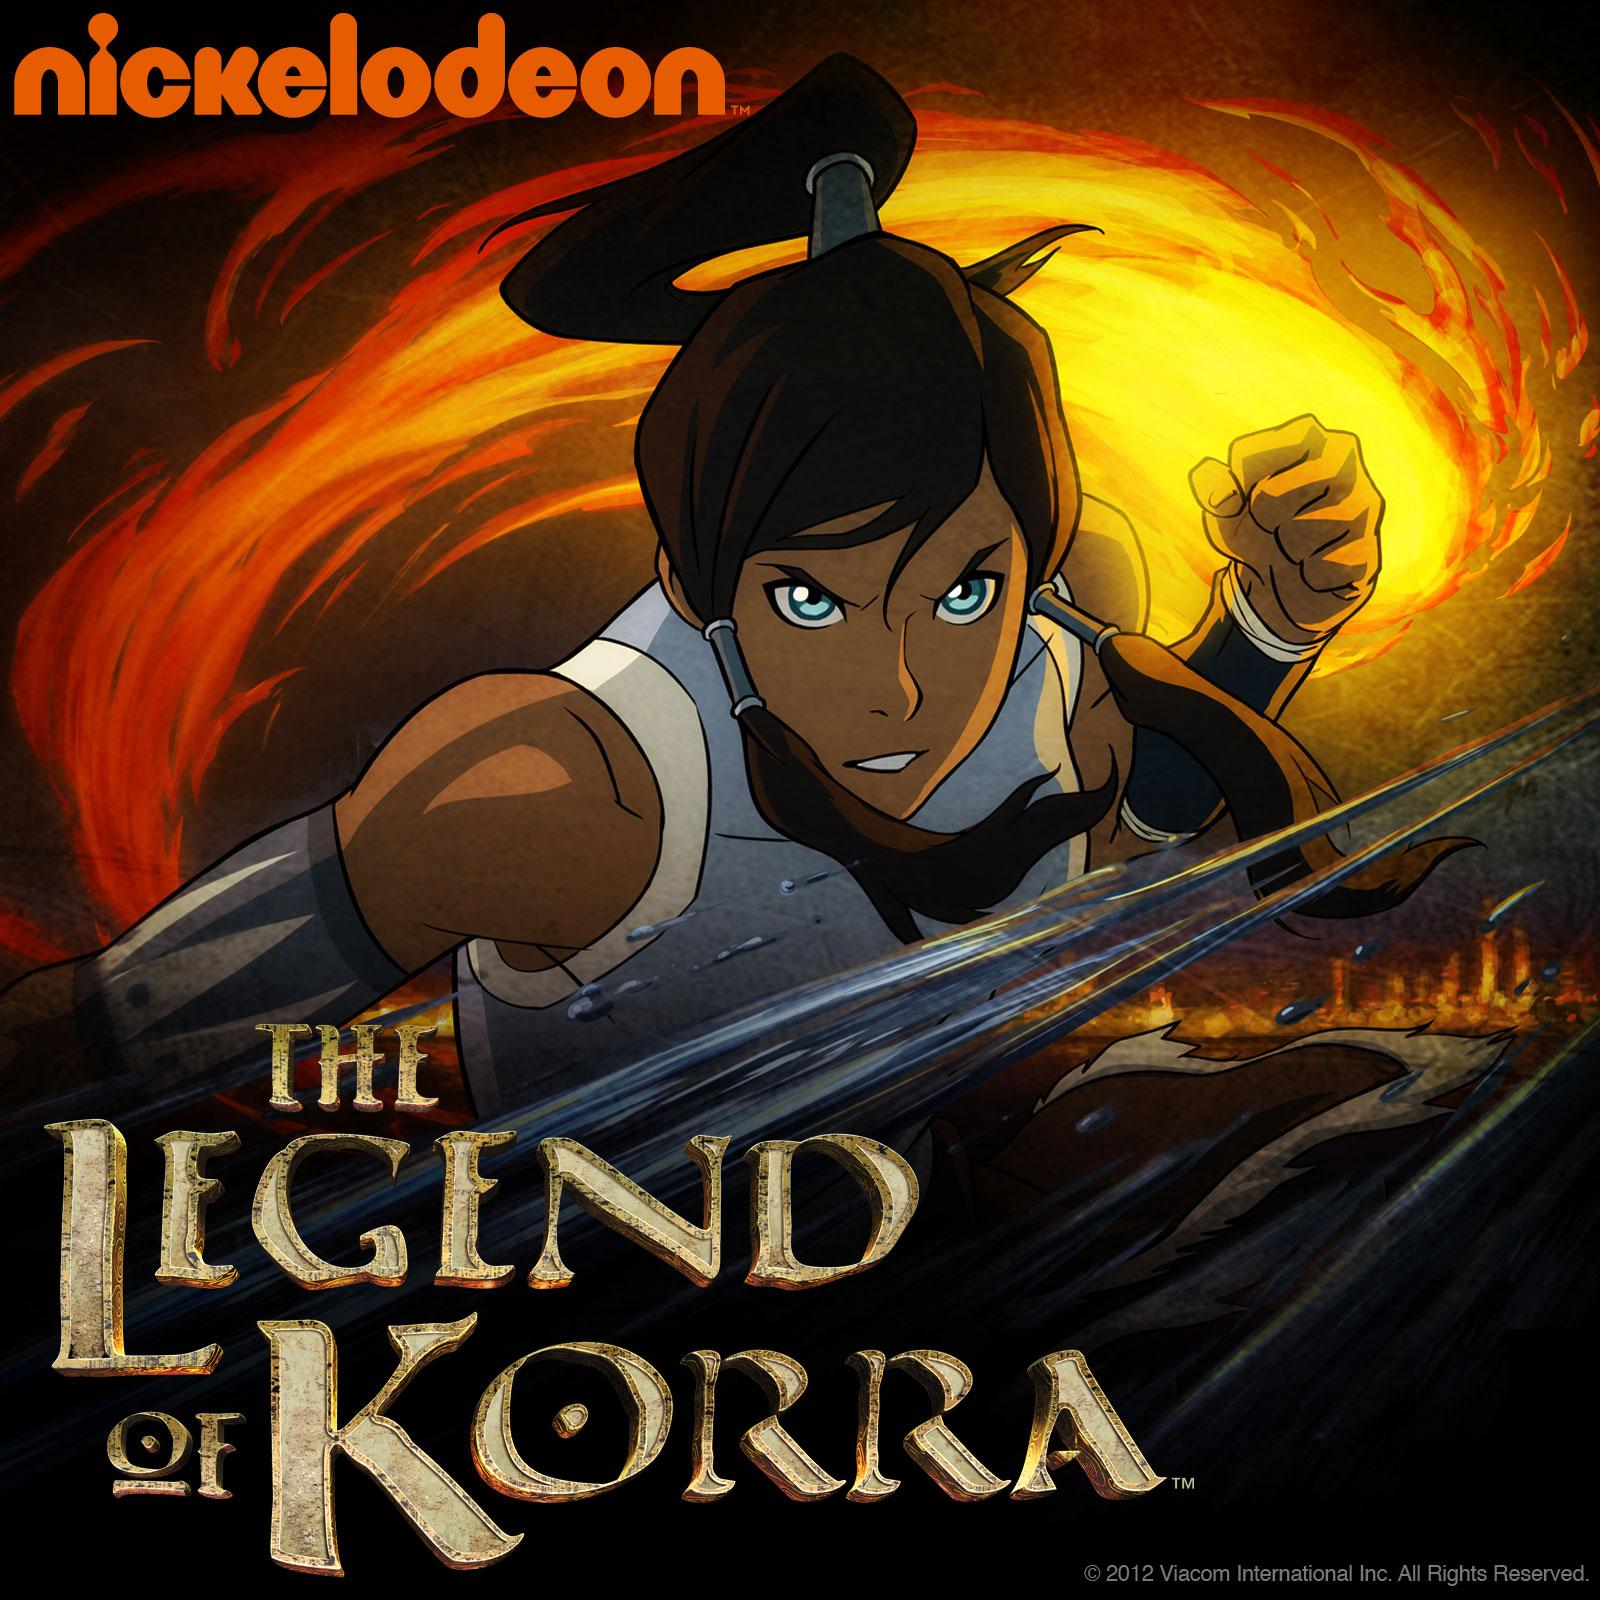 <![CDATA[The Legend of Korra]]>